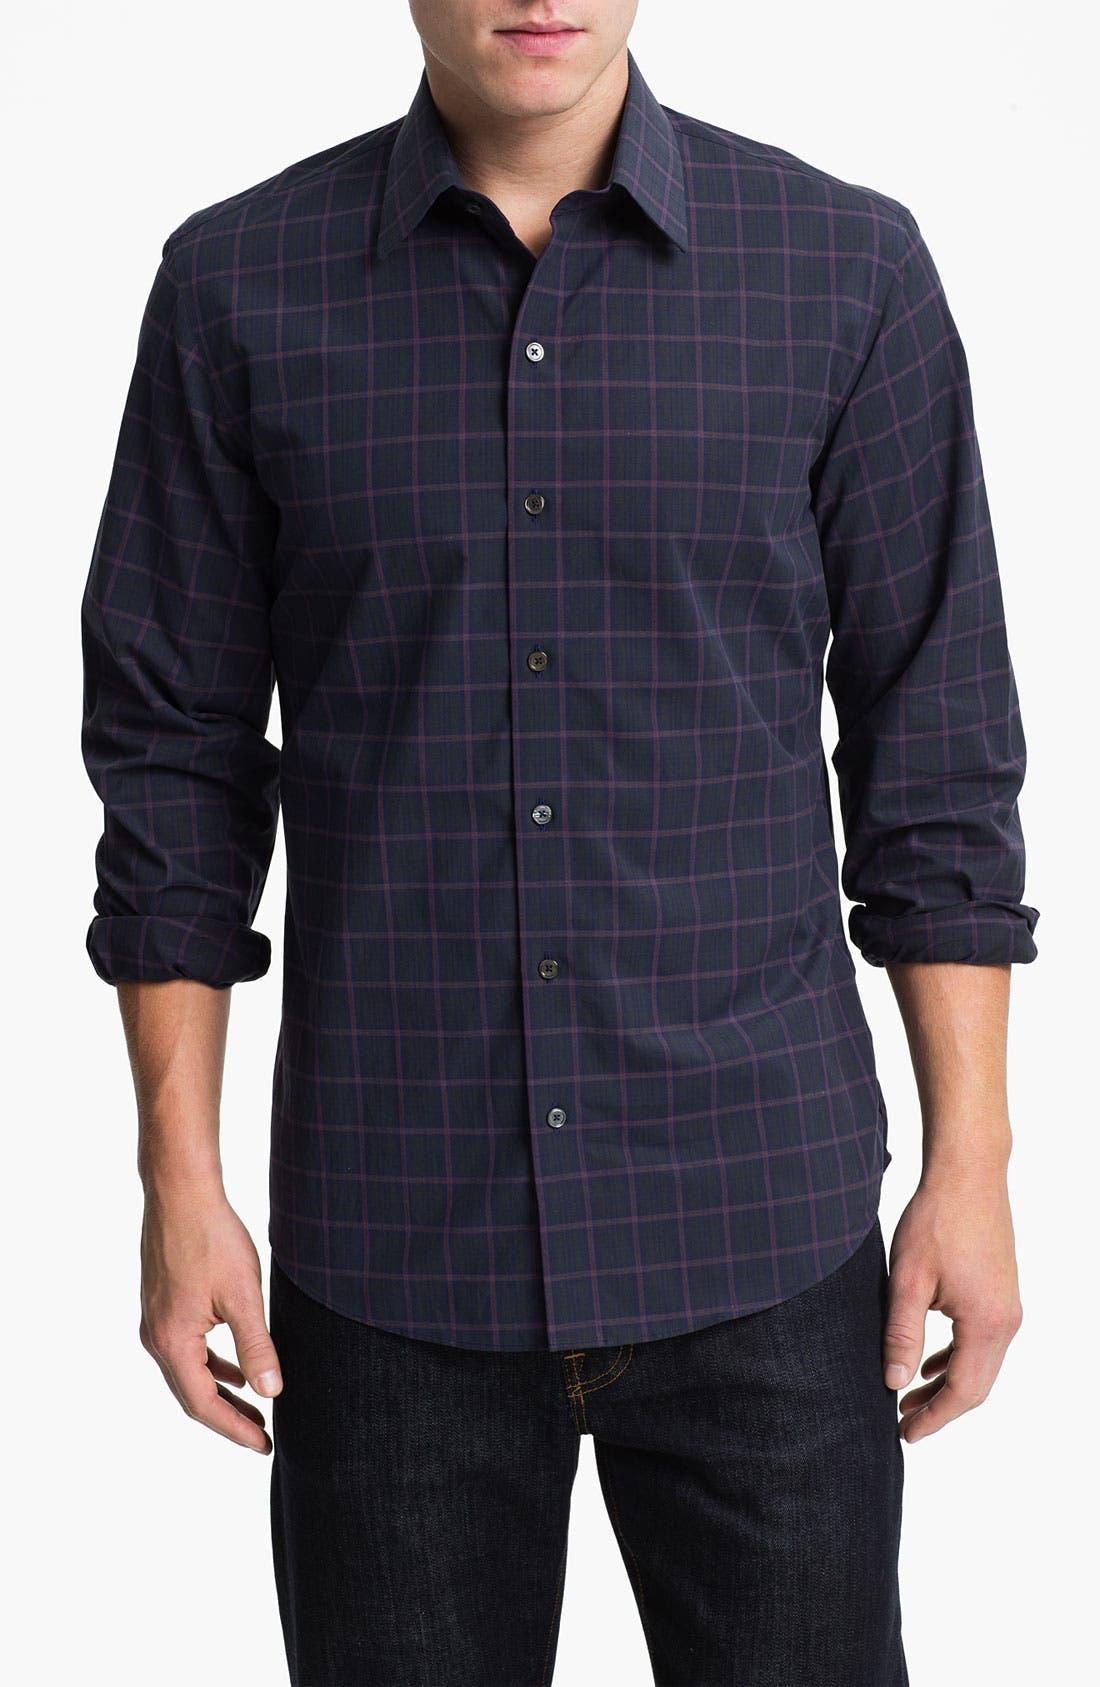 Alternate Image 1 Selected - Zachary Prell 'Handley' Sport Shirt